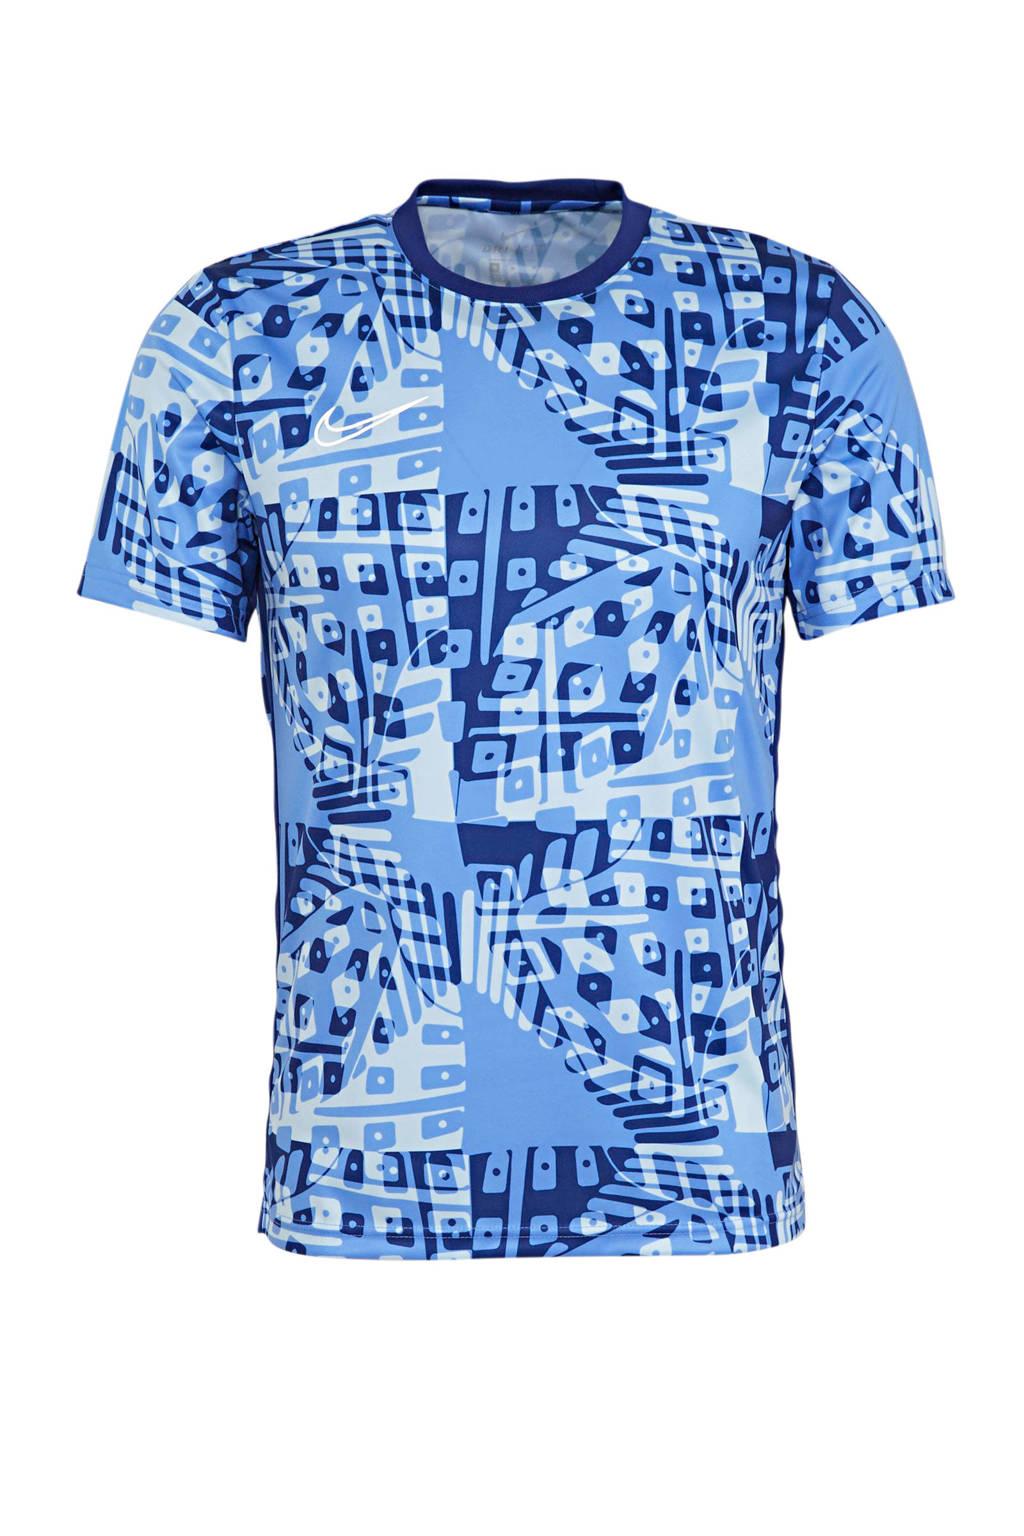 Nike Senior  voetbal T-shirt blauw, Blauw/wit